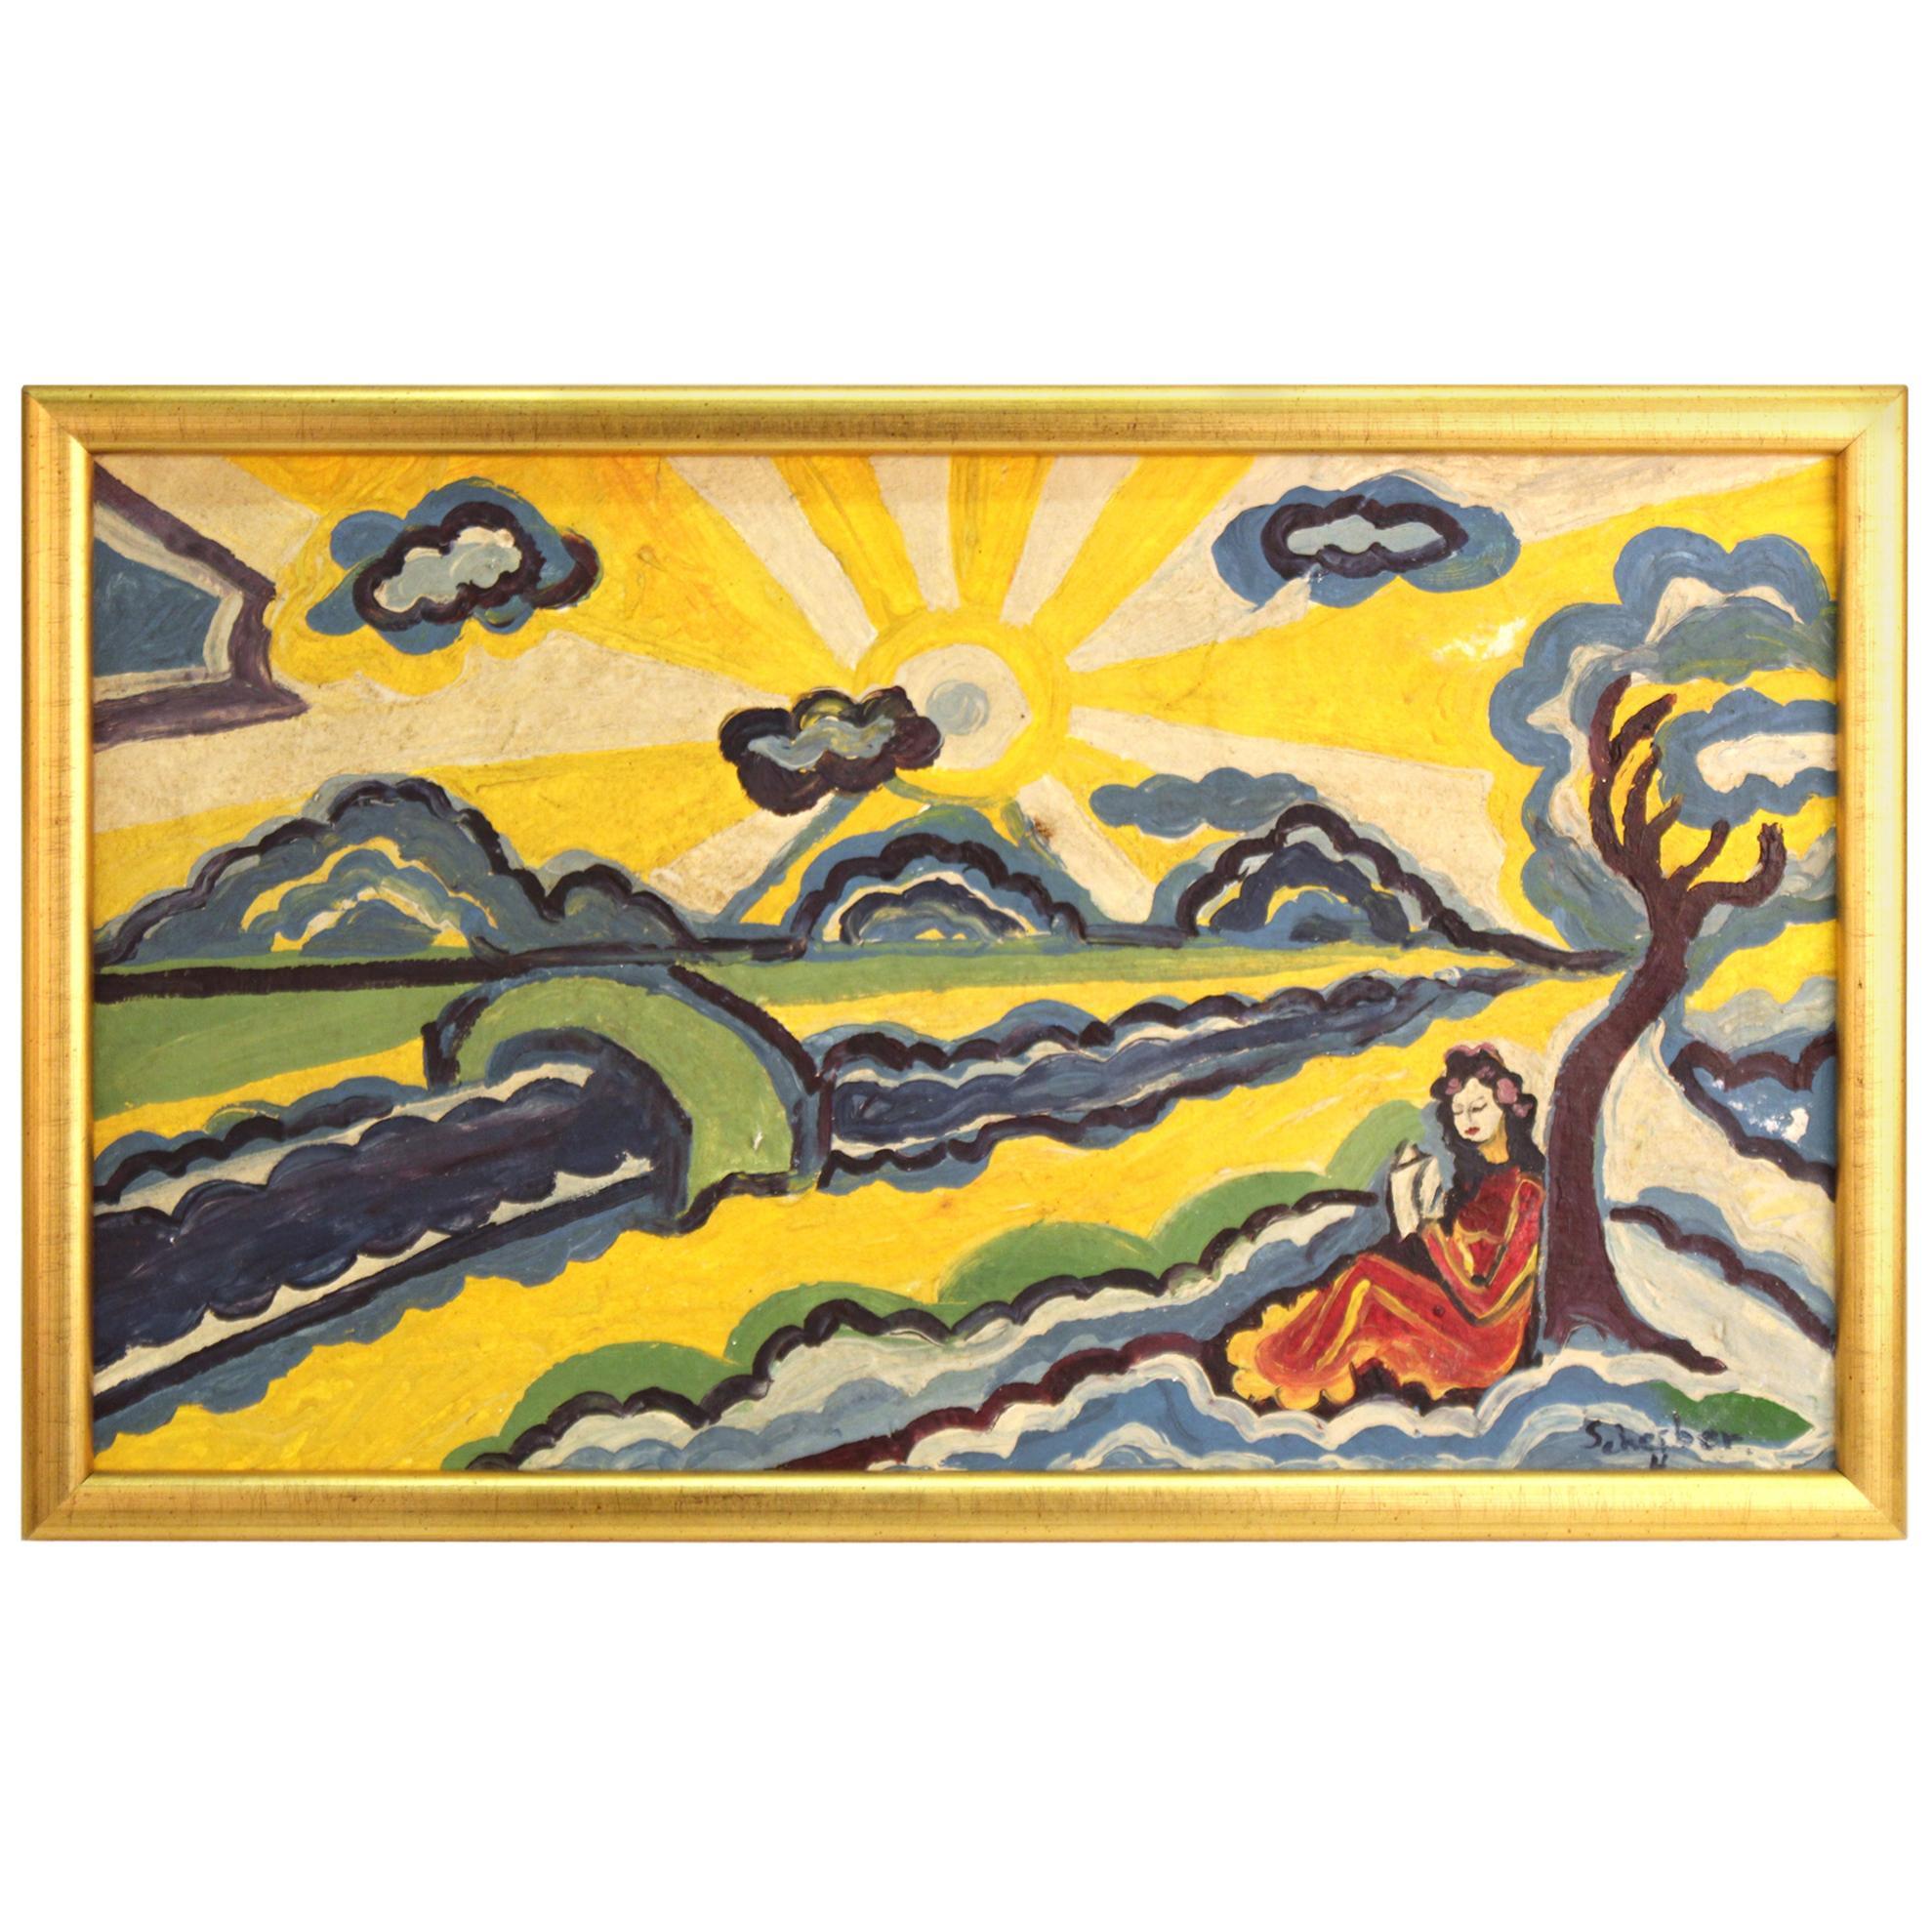 Modernist Landscape Painting Attributed to Hugo Scheiber